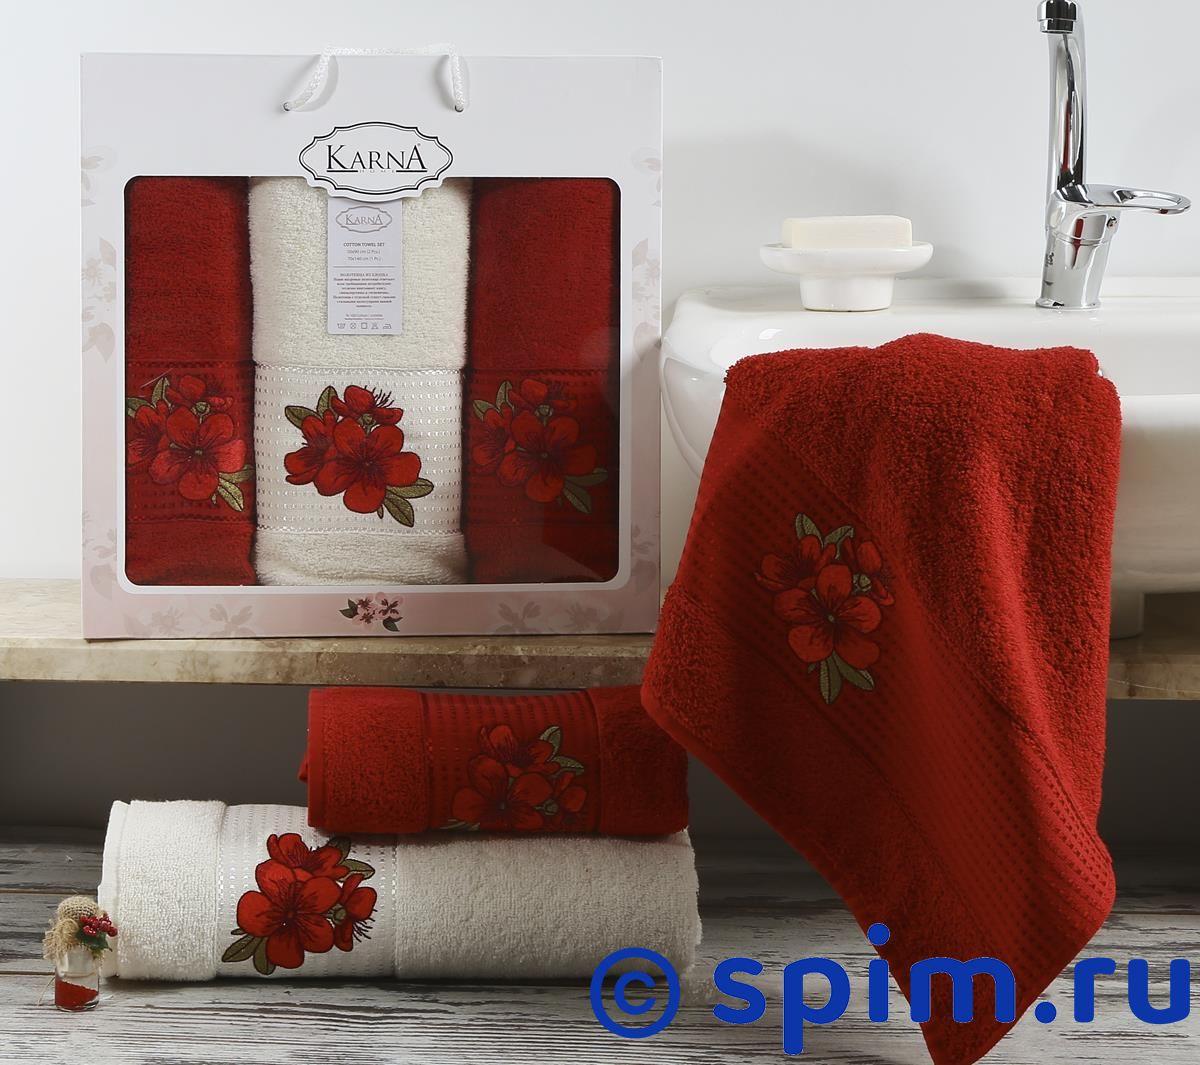 Комплект полотенец Karna Orkide, бордовый арт. 2361/char002 комплект полотенец karna victory бордовый арт 2386 char002